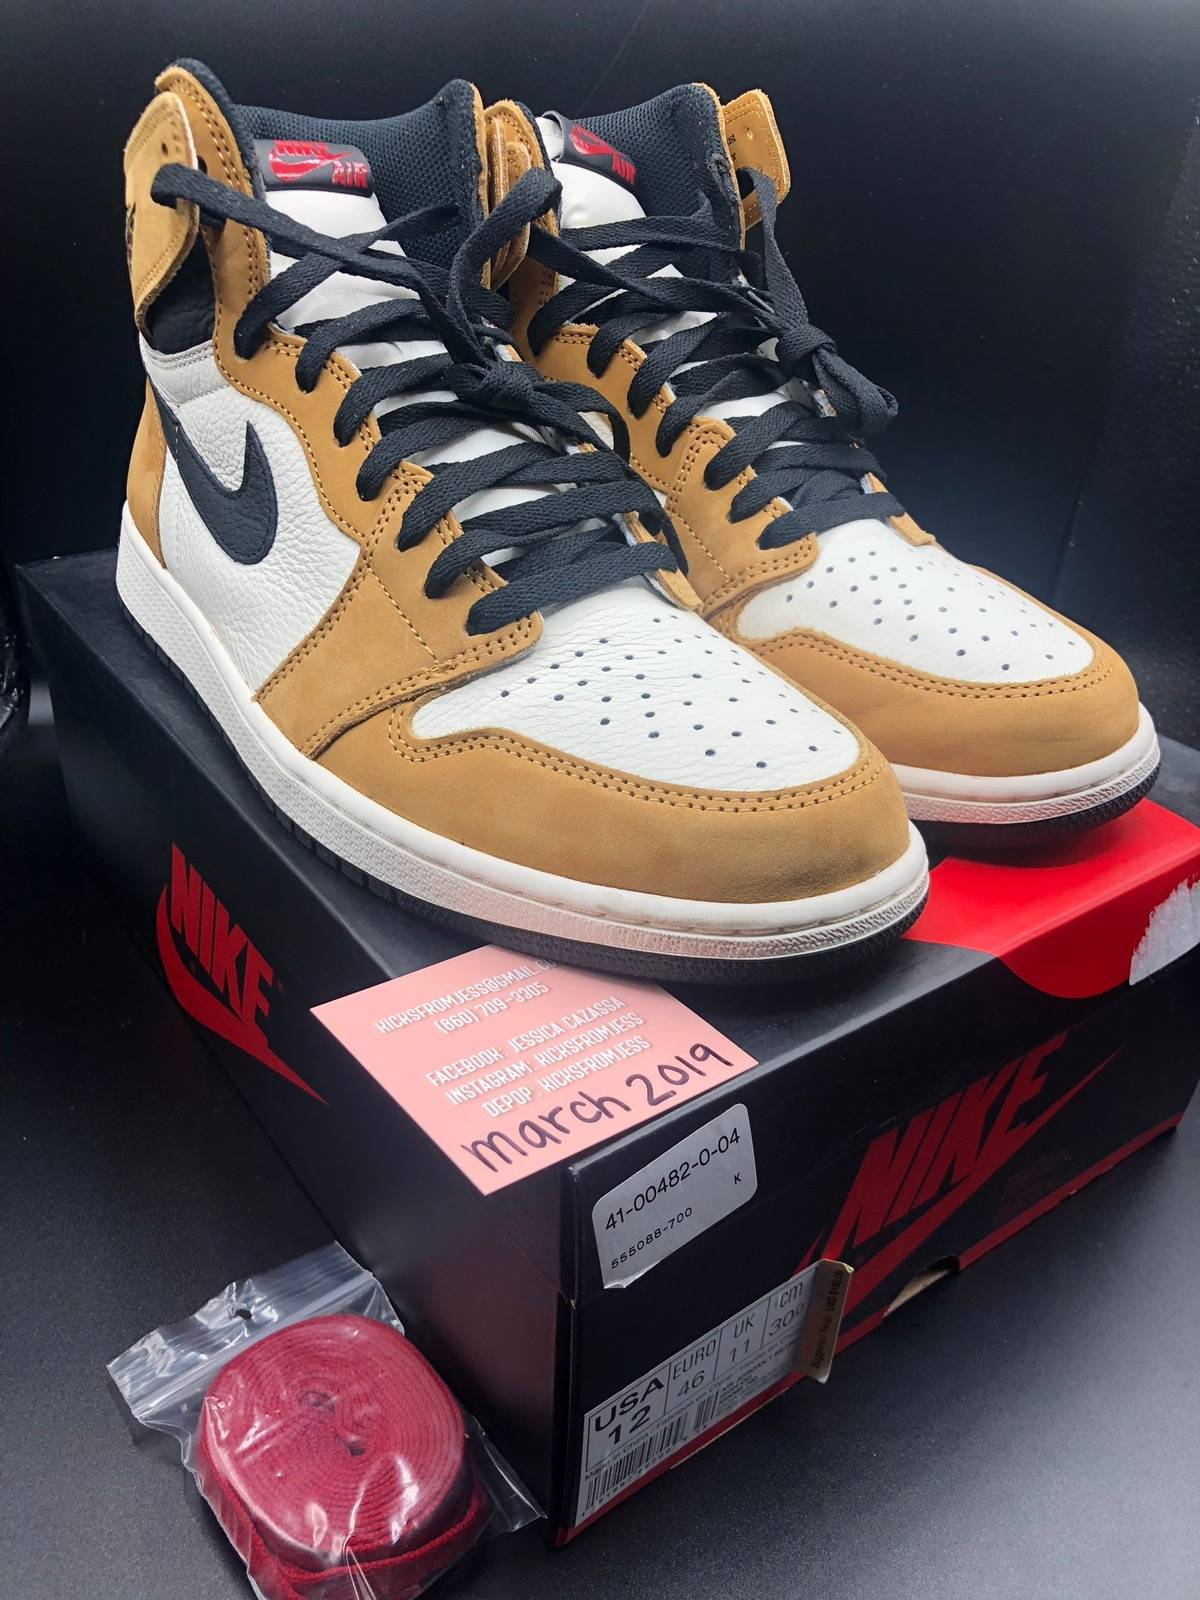 0289c693af02 Nike Air Jordan Retro 1 Roty Or Rookie Of The Year